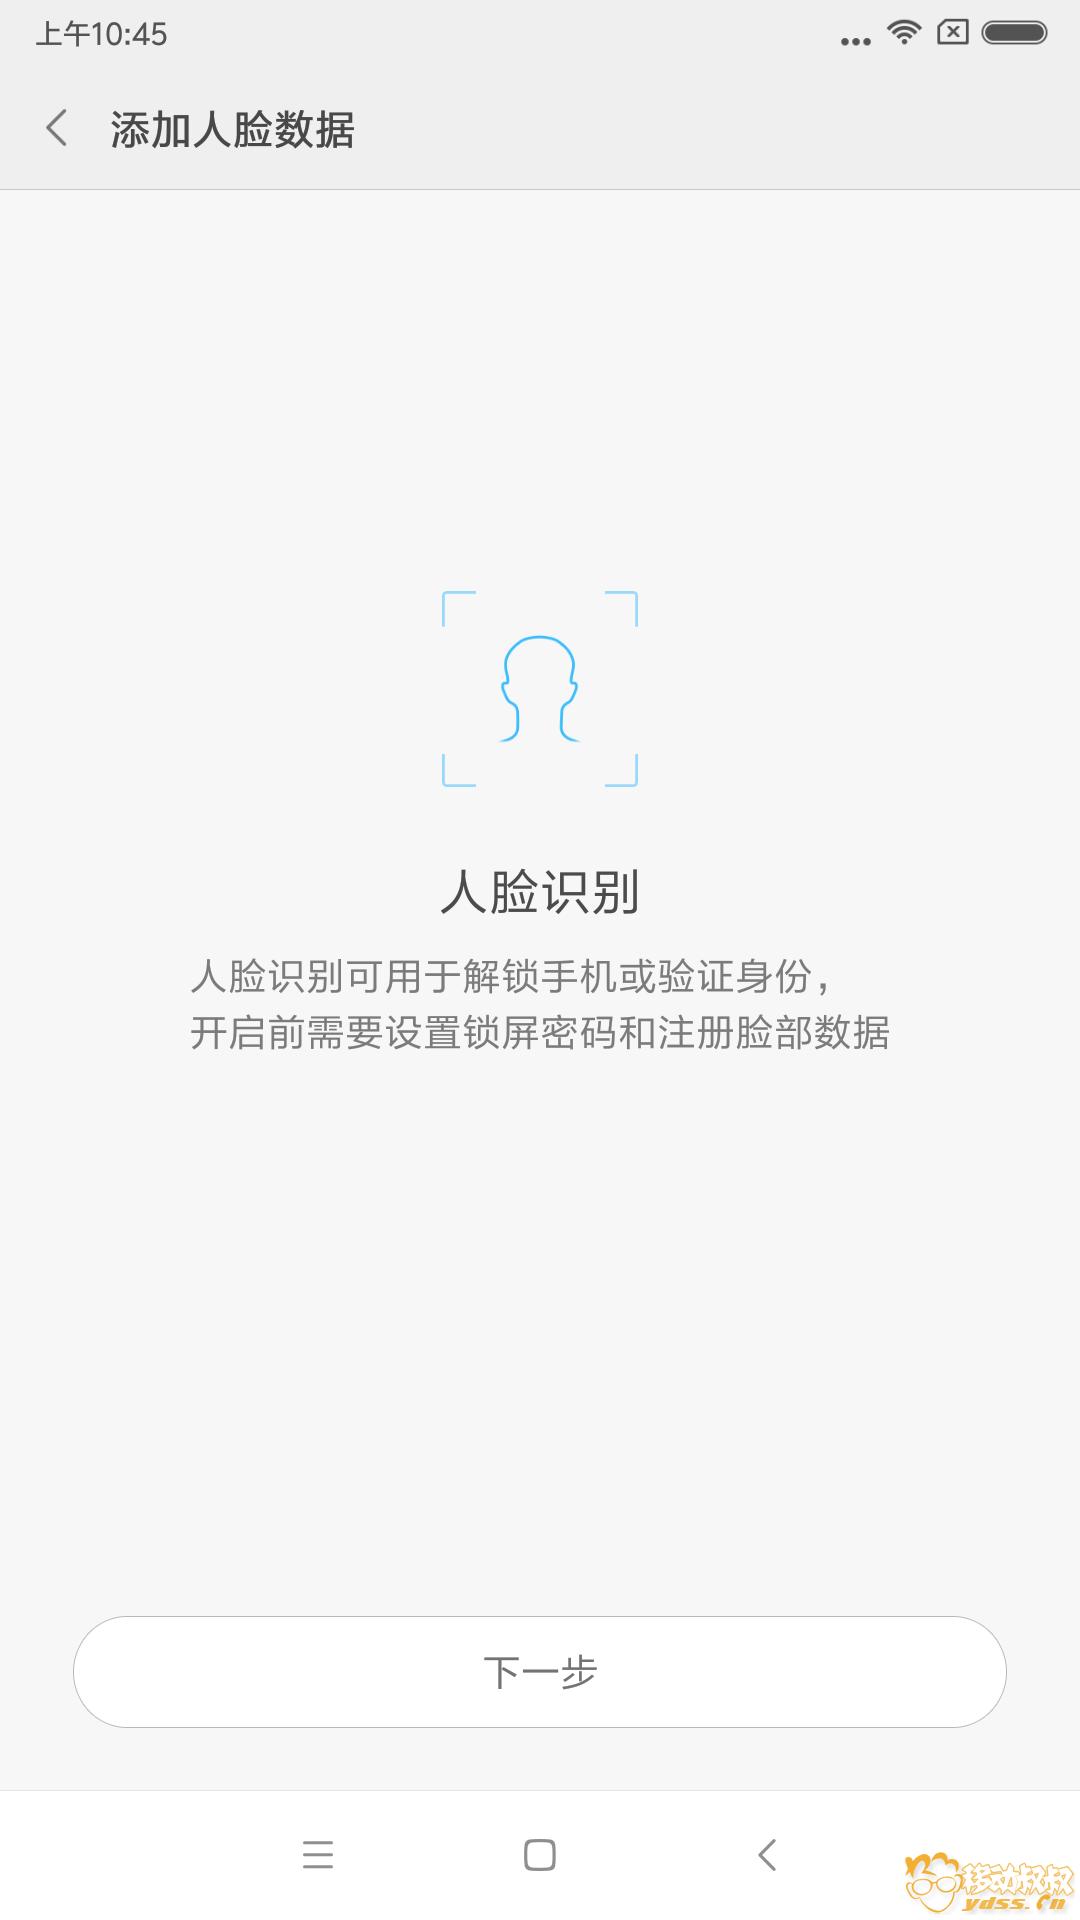 Screenshot_2018-03-09-10-45-16-928_com.android.keyguard.png